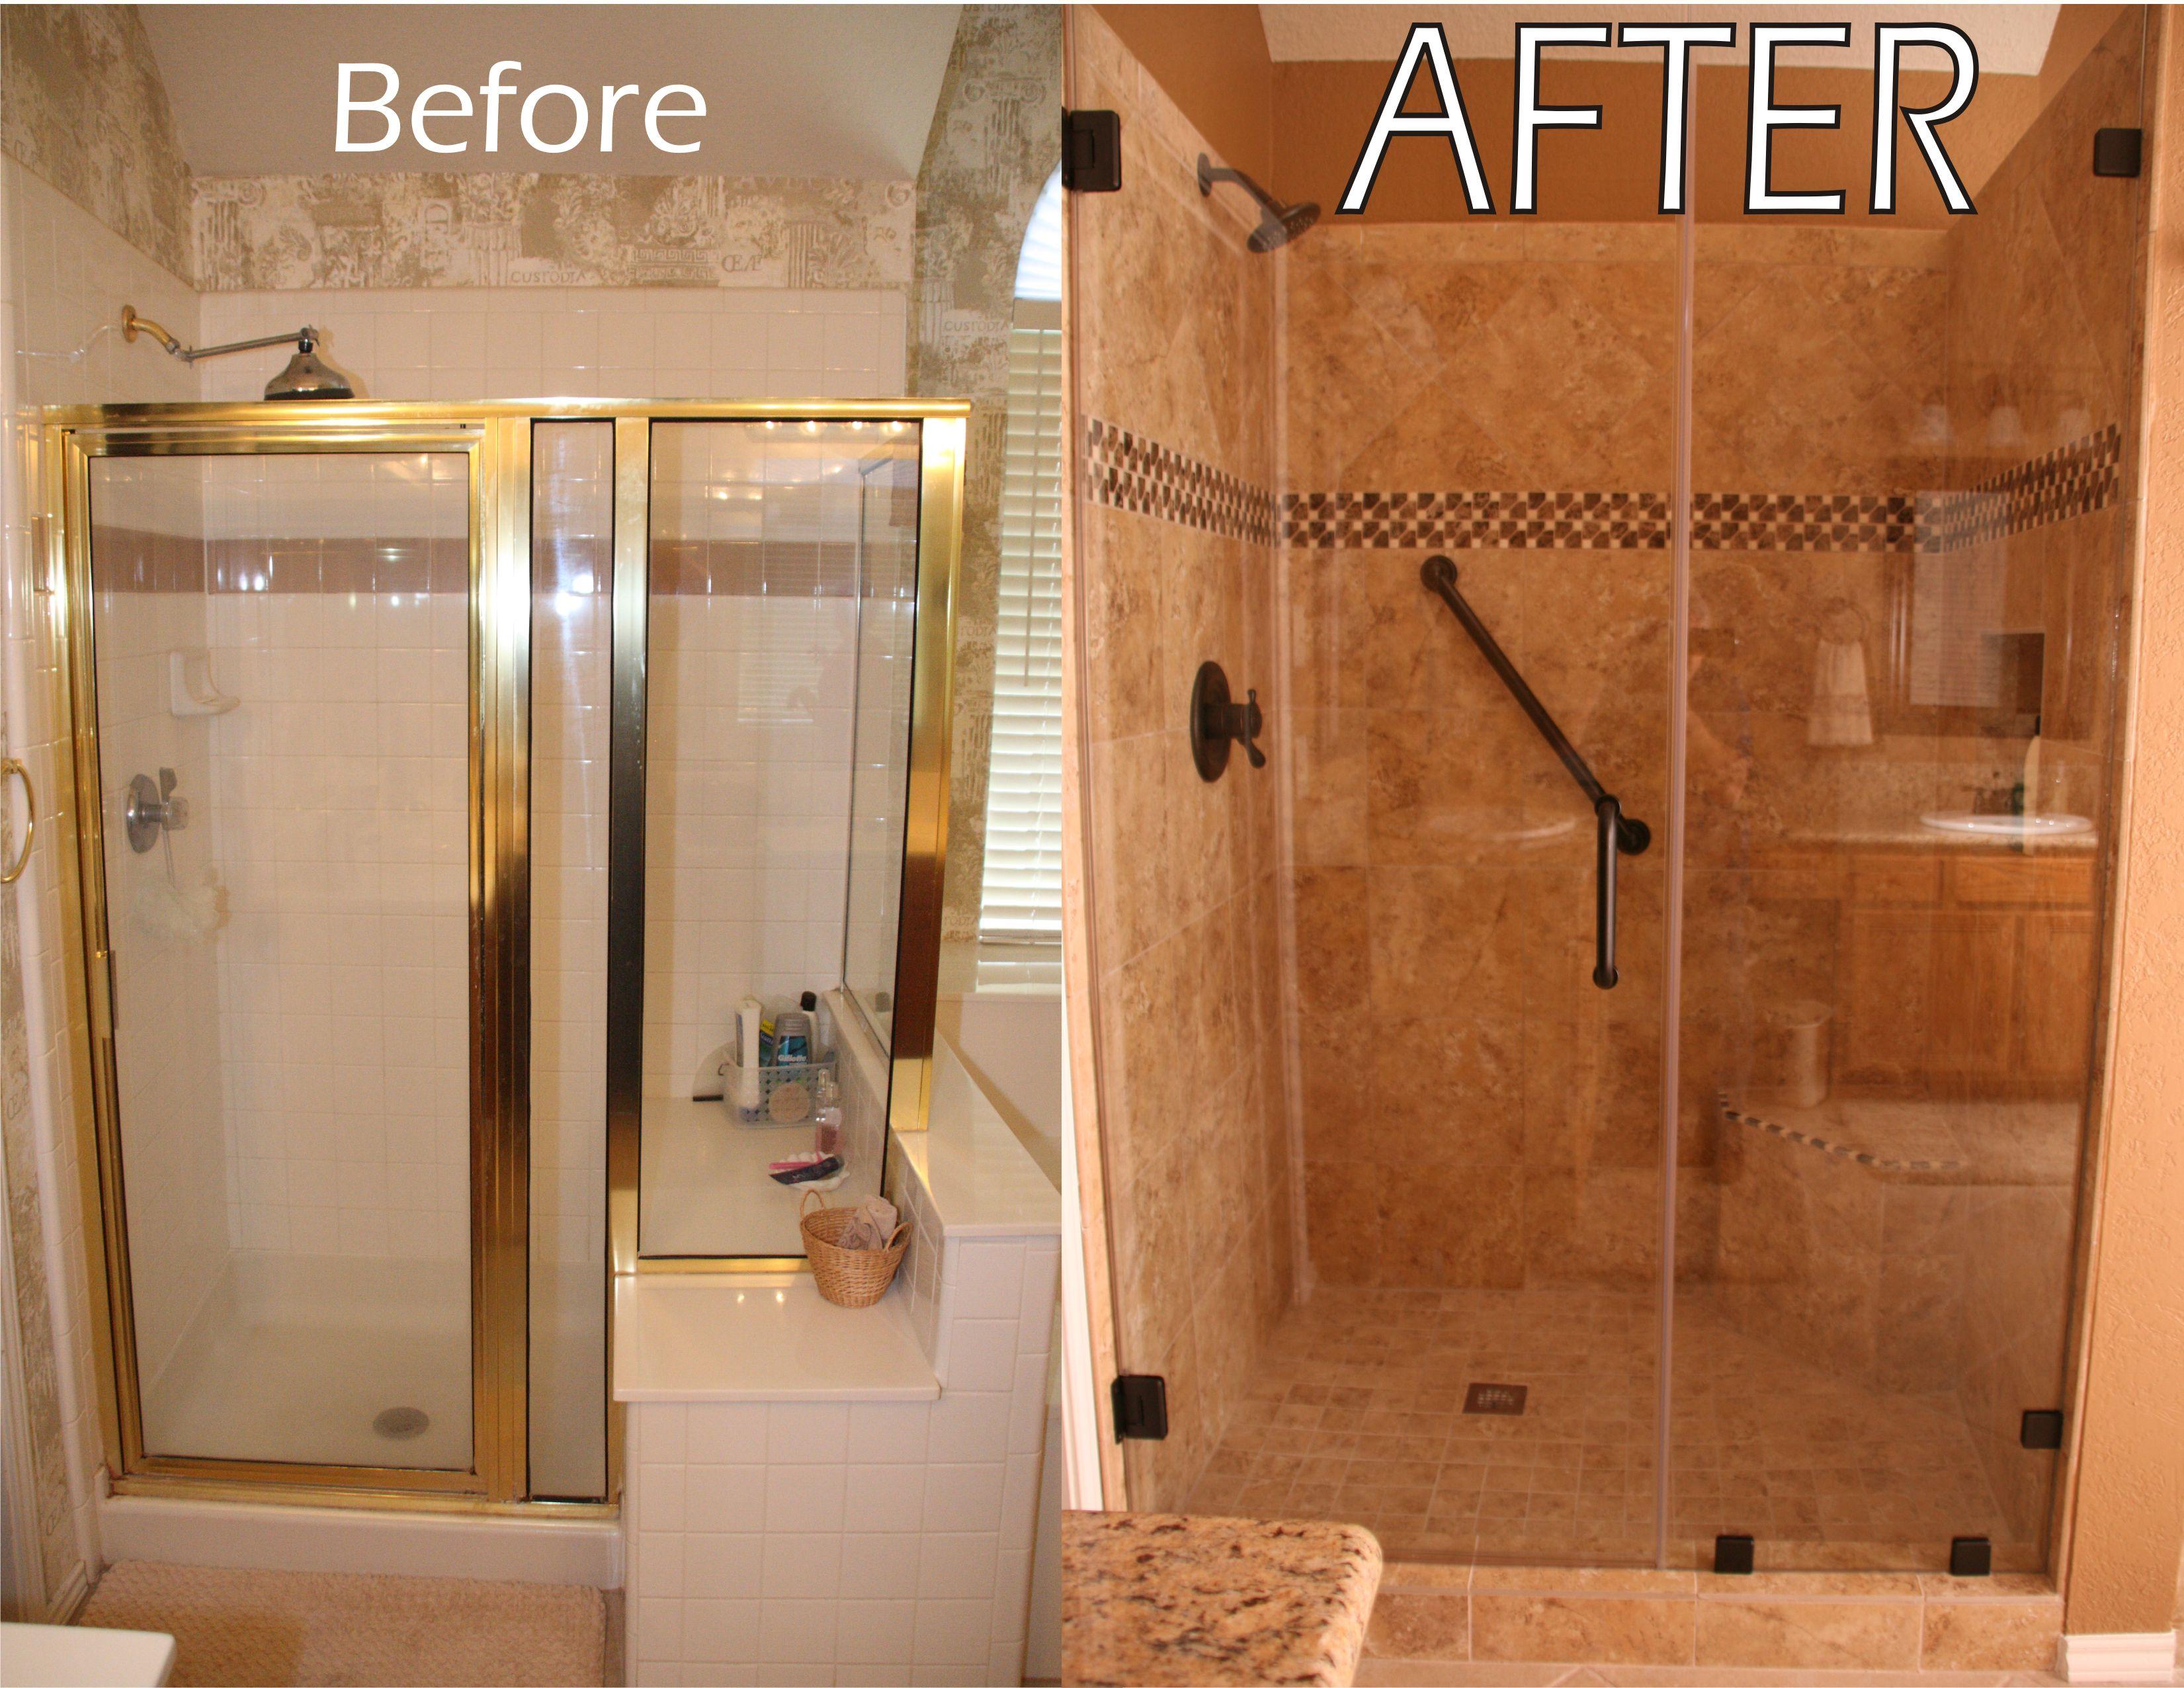 Bathroom Remodels Make a Big Splash This Spring | Bathroom